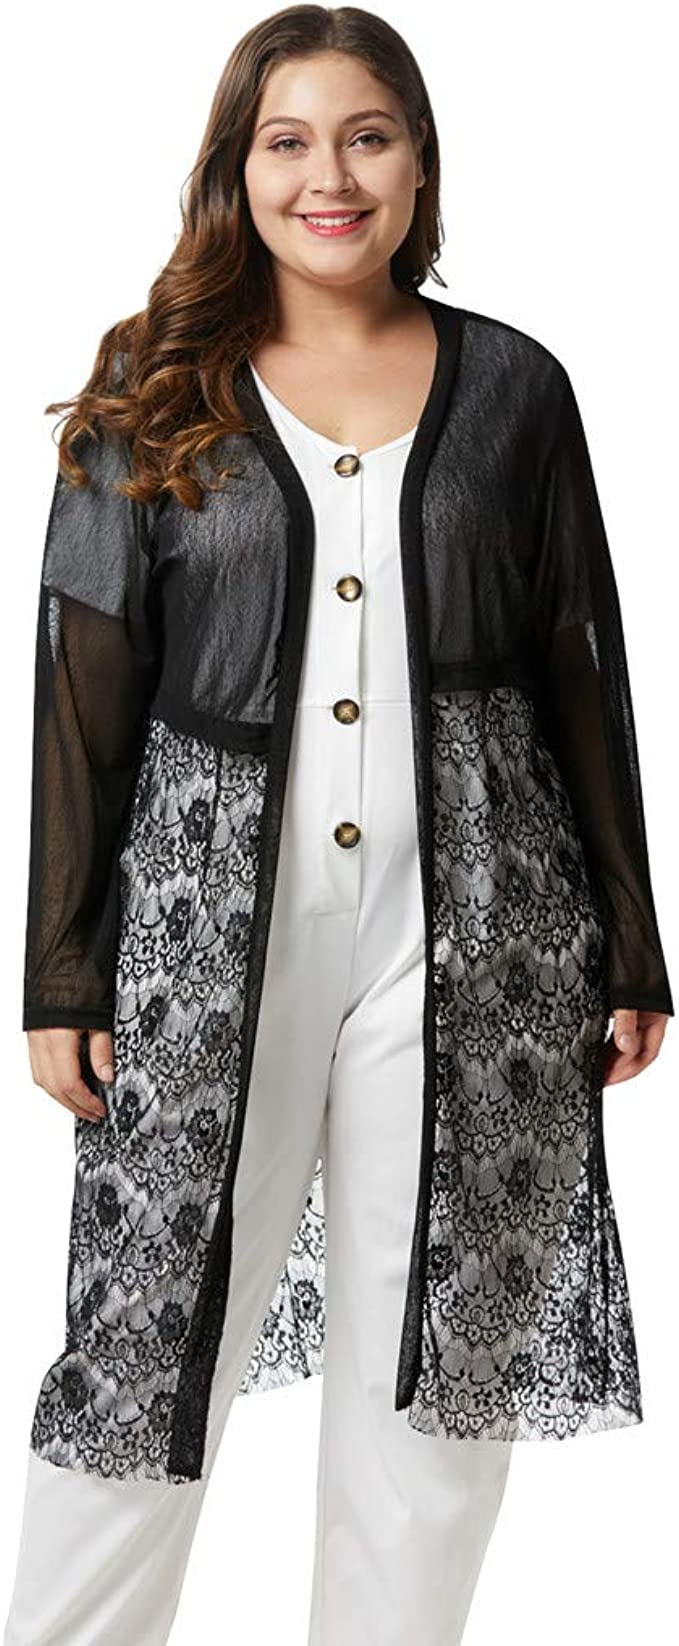 KLJR Women Casual Solid Sunscreen Plus Size Cardigan Coat